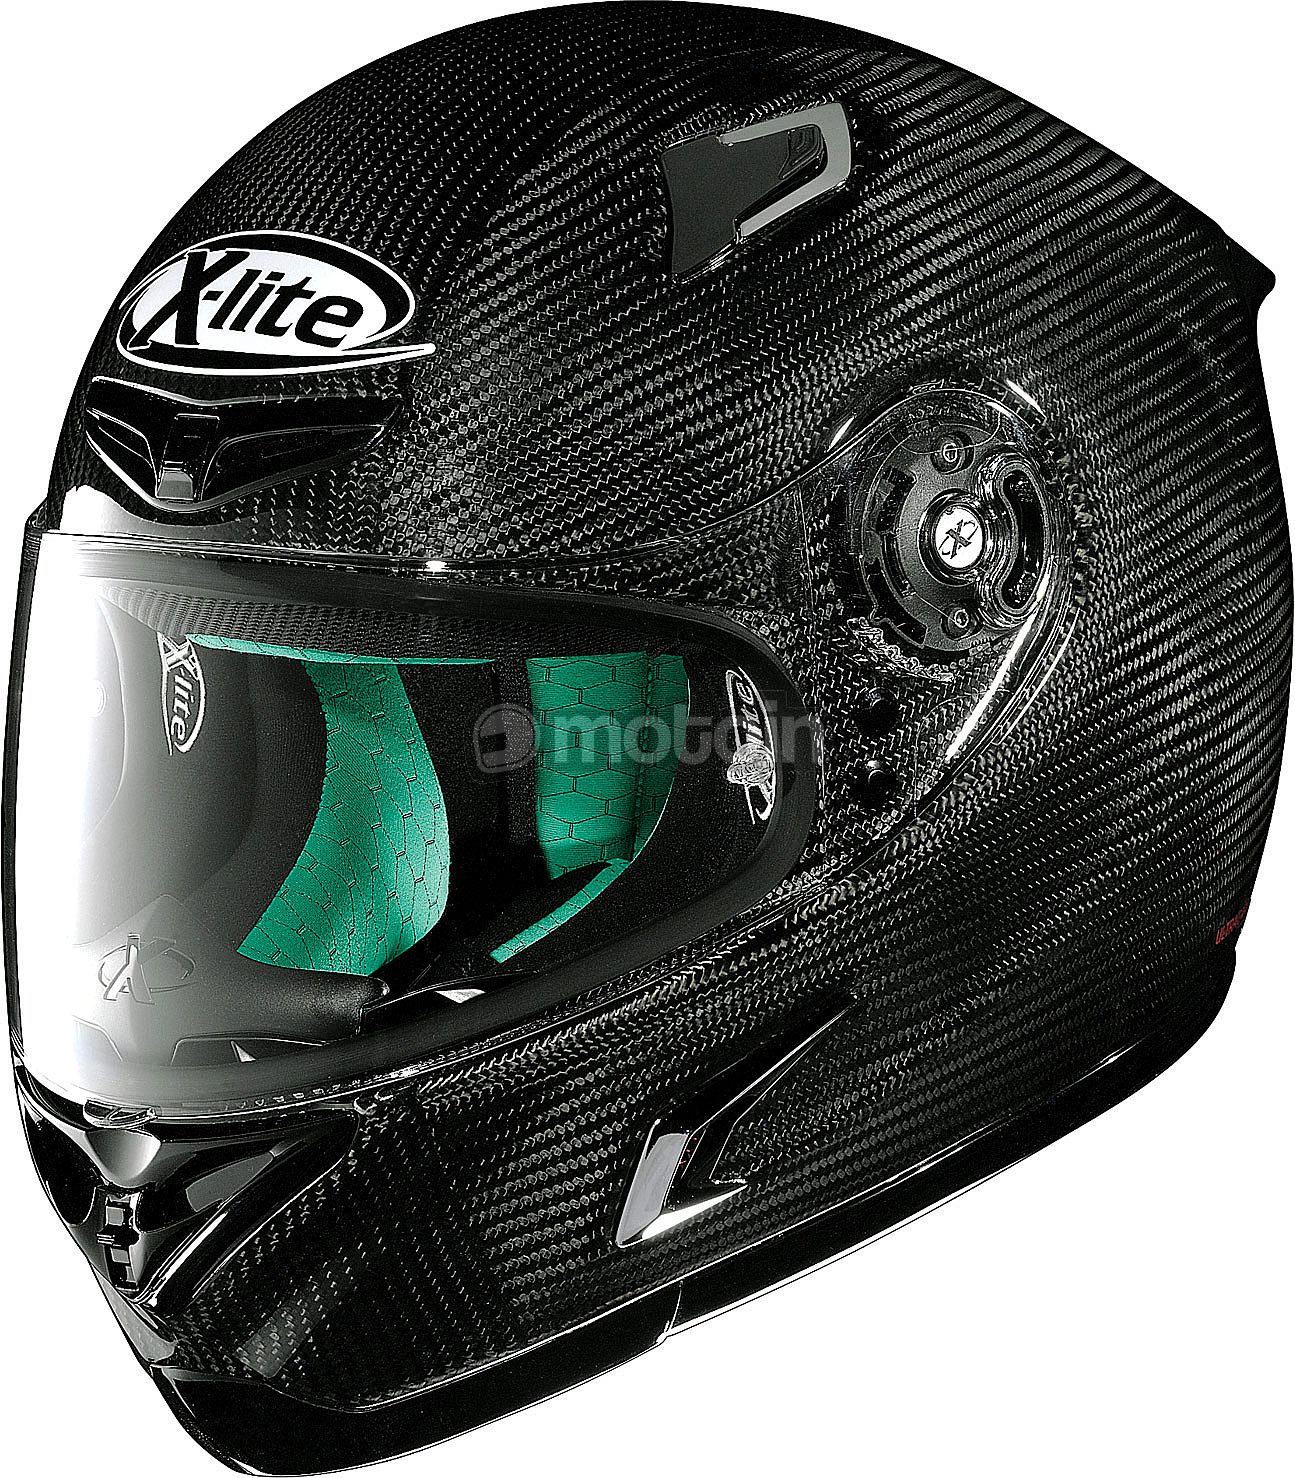 x lite x 802rr ultra carbon puro integral helmet. Black Bedroom Furniture Sets. Home Design Ideas